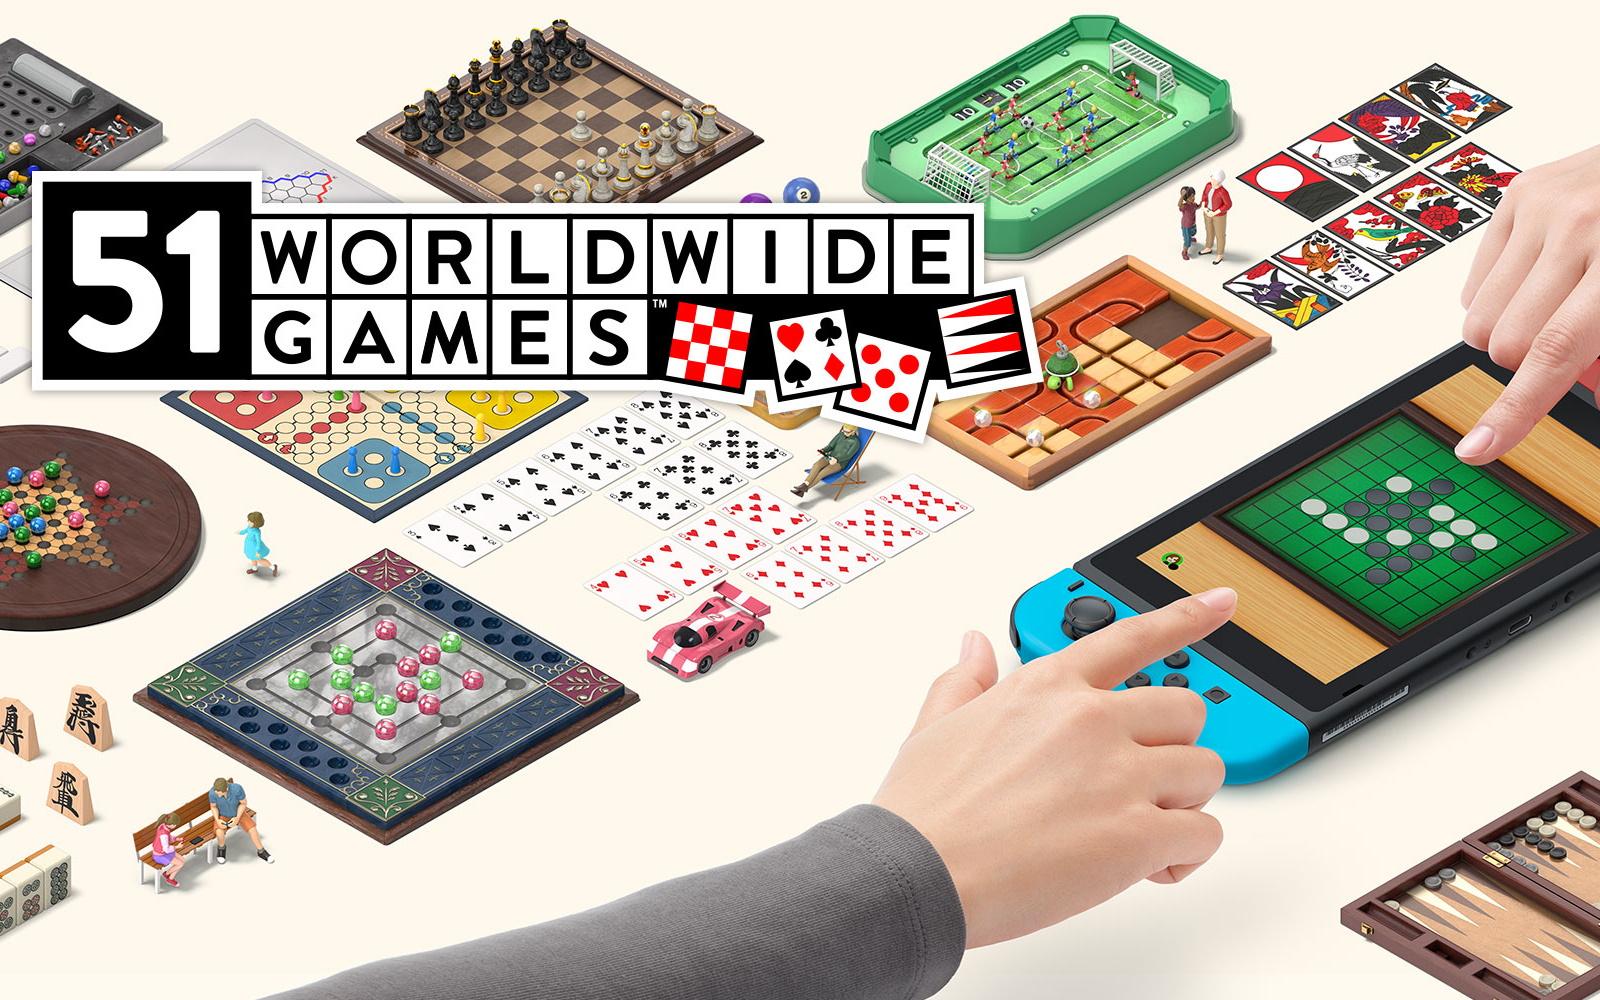 Take On Friends In 51 Worldwide Games On Switch